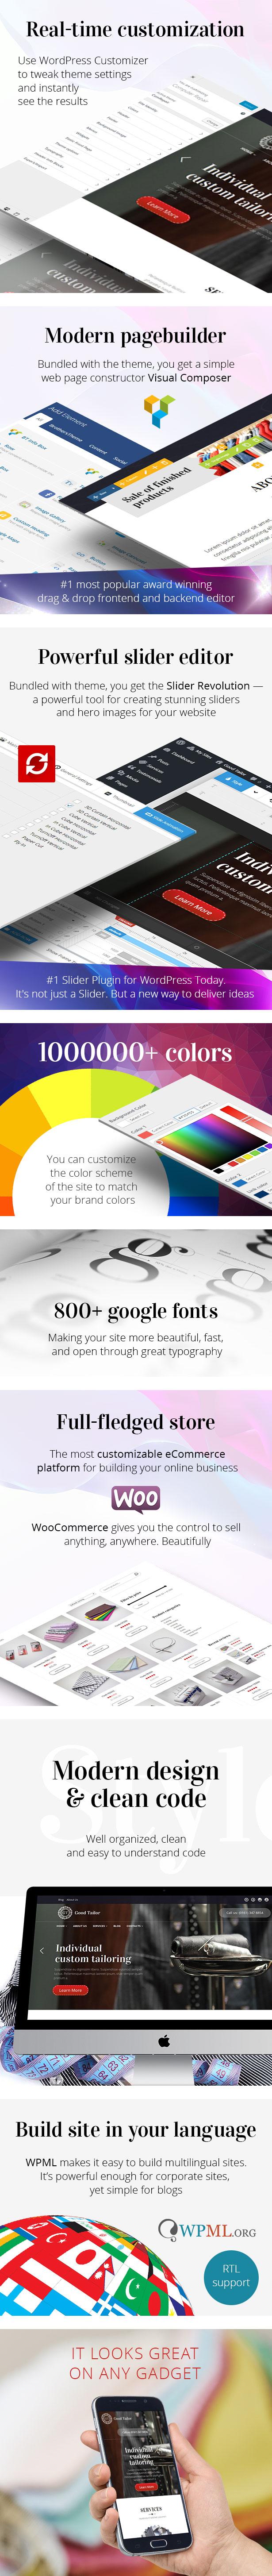 Good Tailor - Fashion & Tailoring Services WordPress Theme - 2